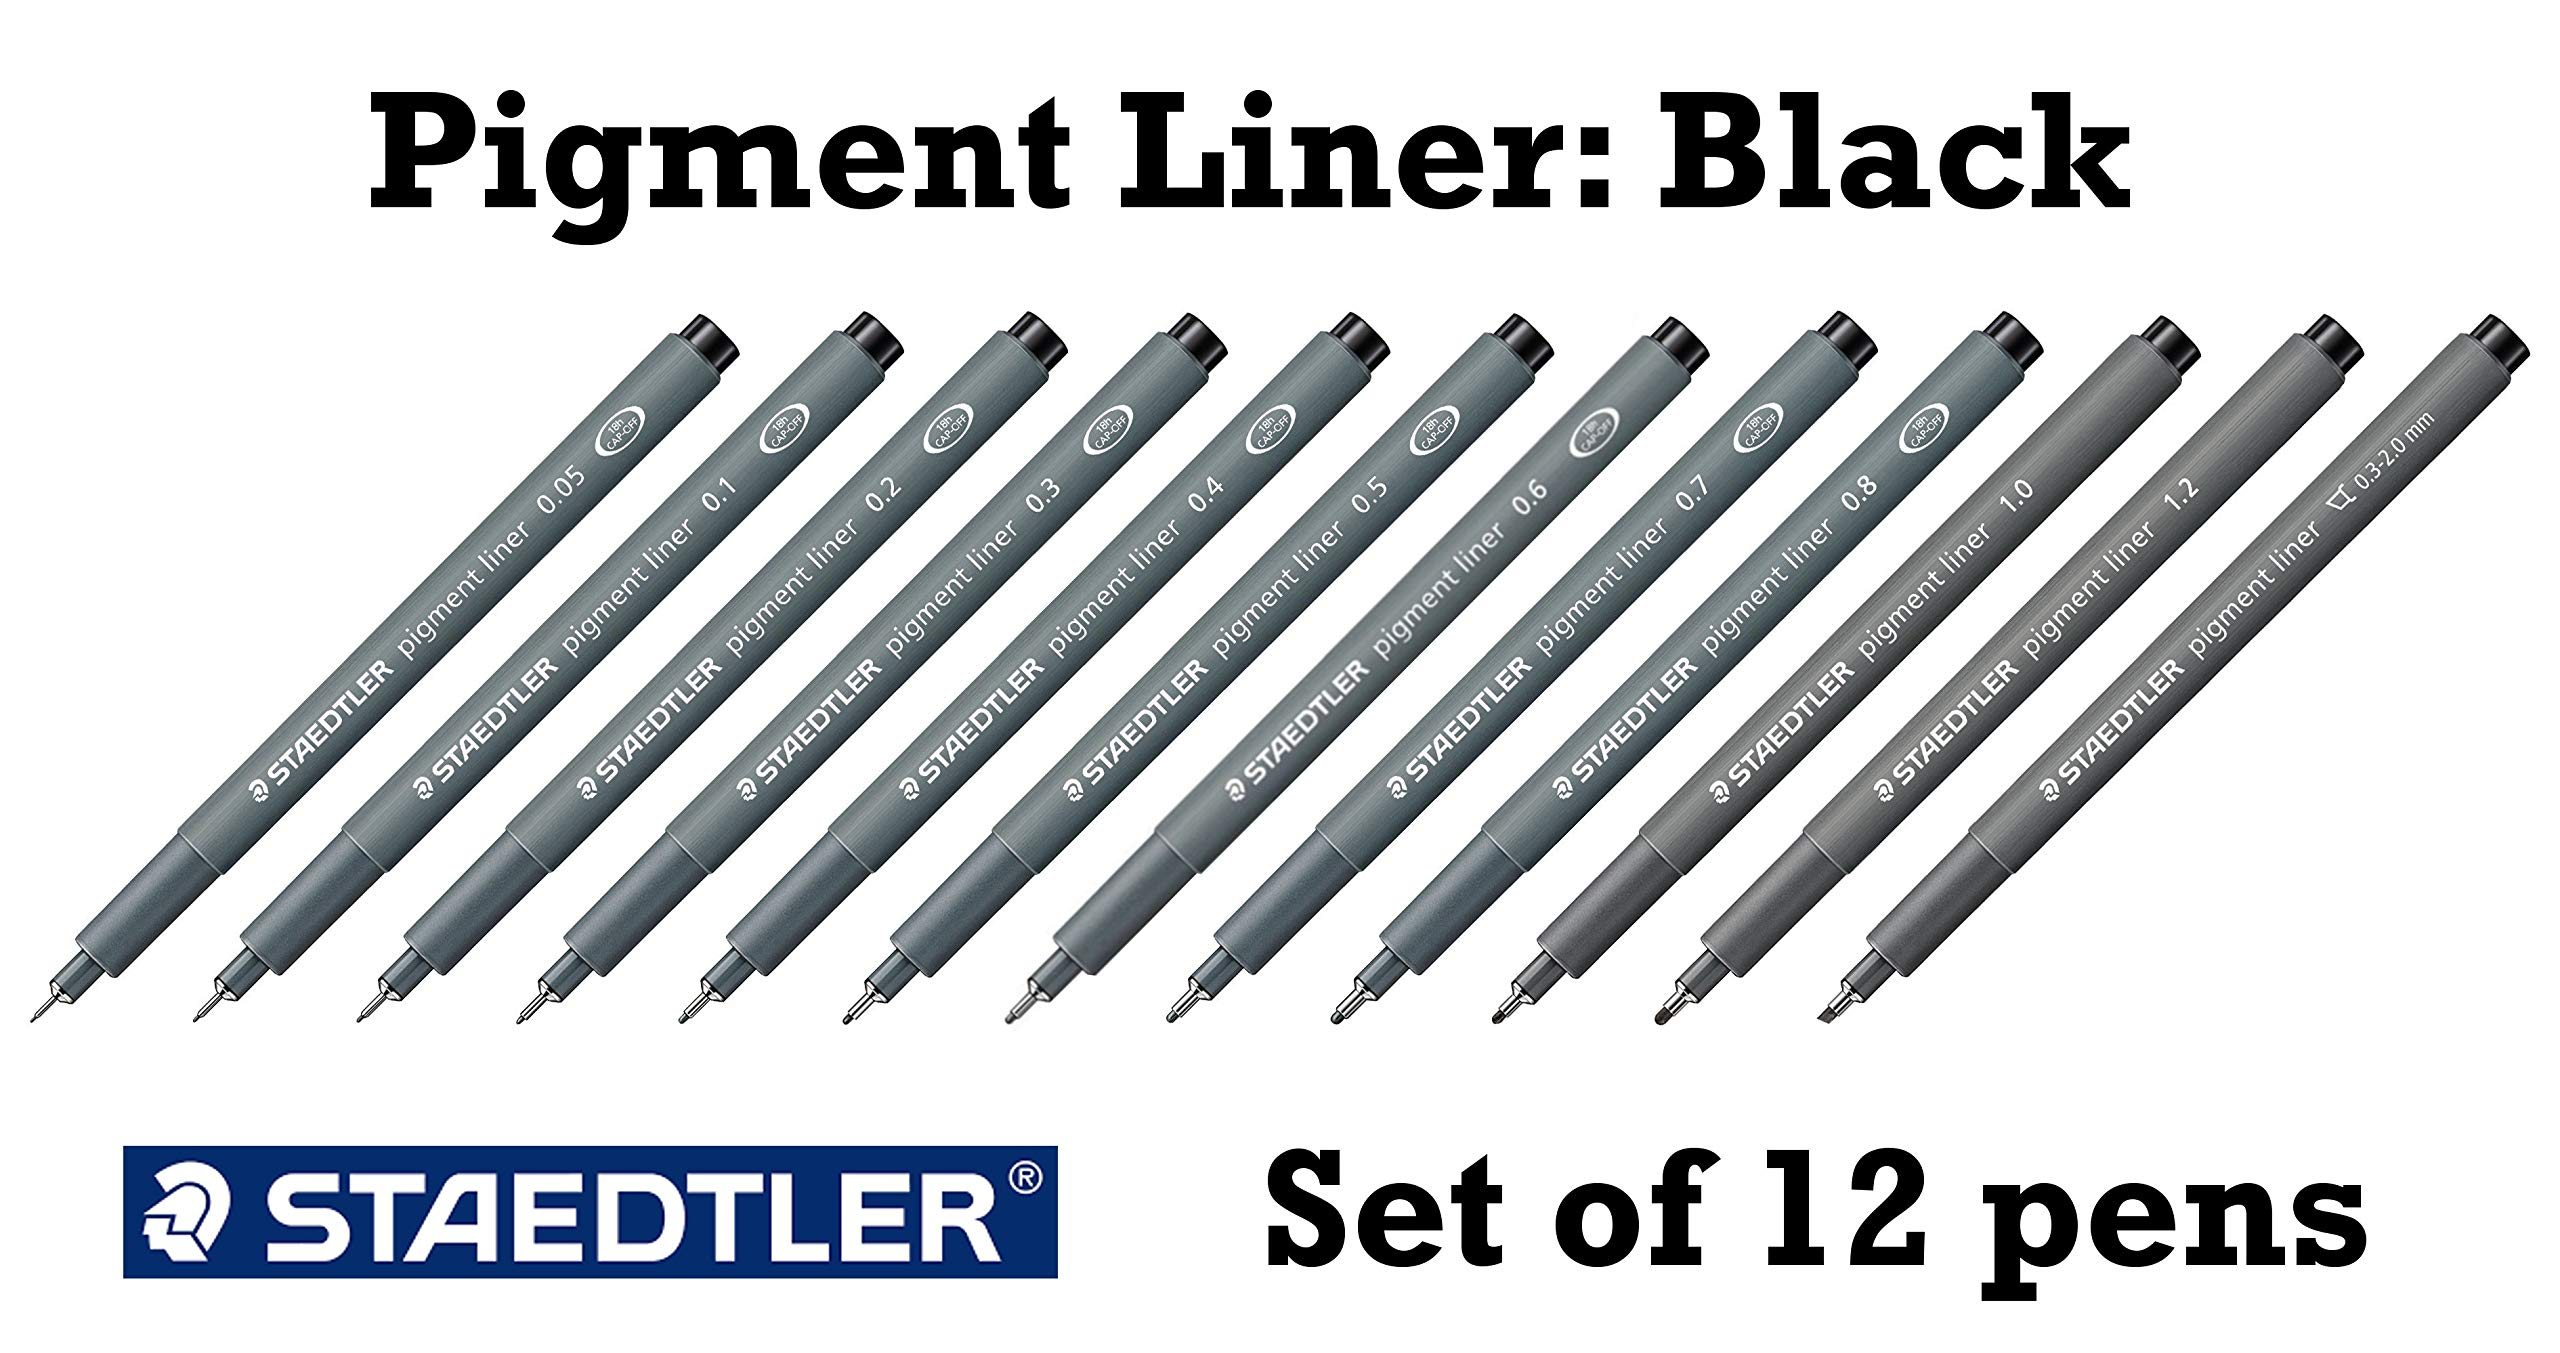 Staedtler Pigment Liner black fineliner pens, full professional 12 pieces artist drawing technical drafting sets by Staedtler (Image #4)